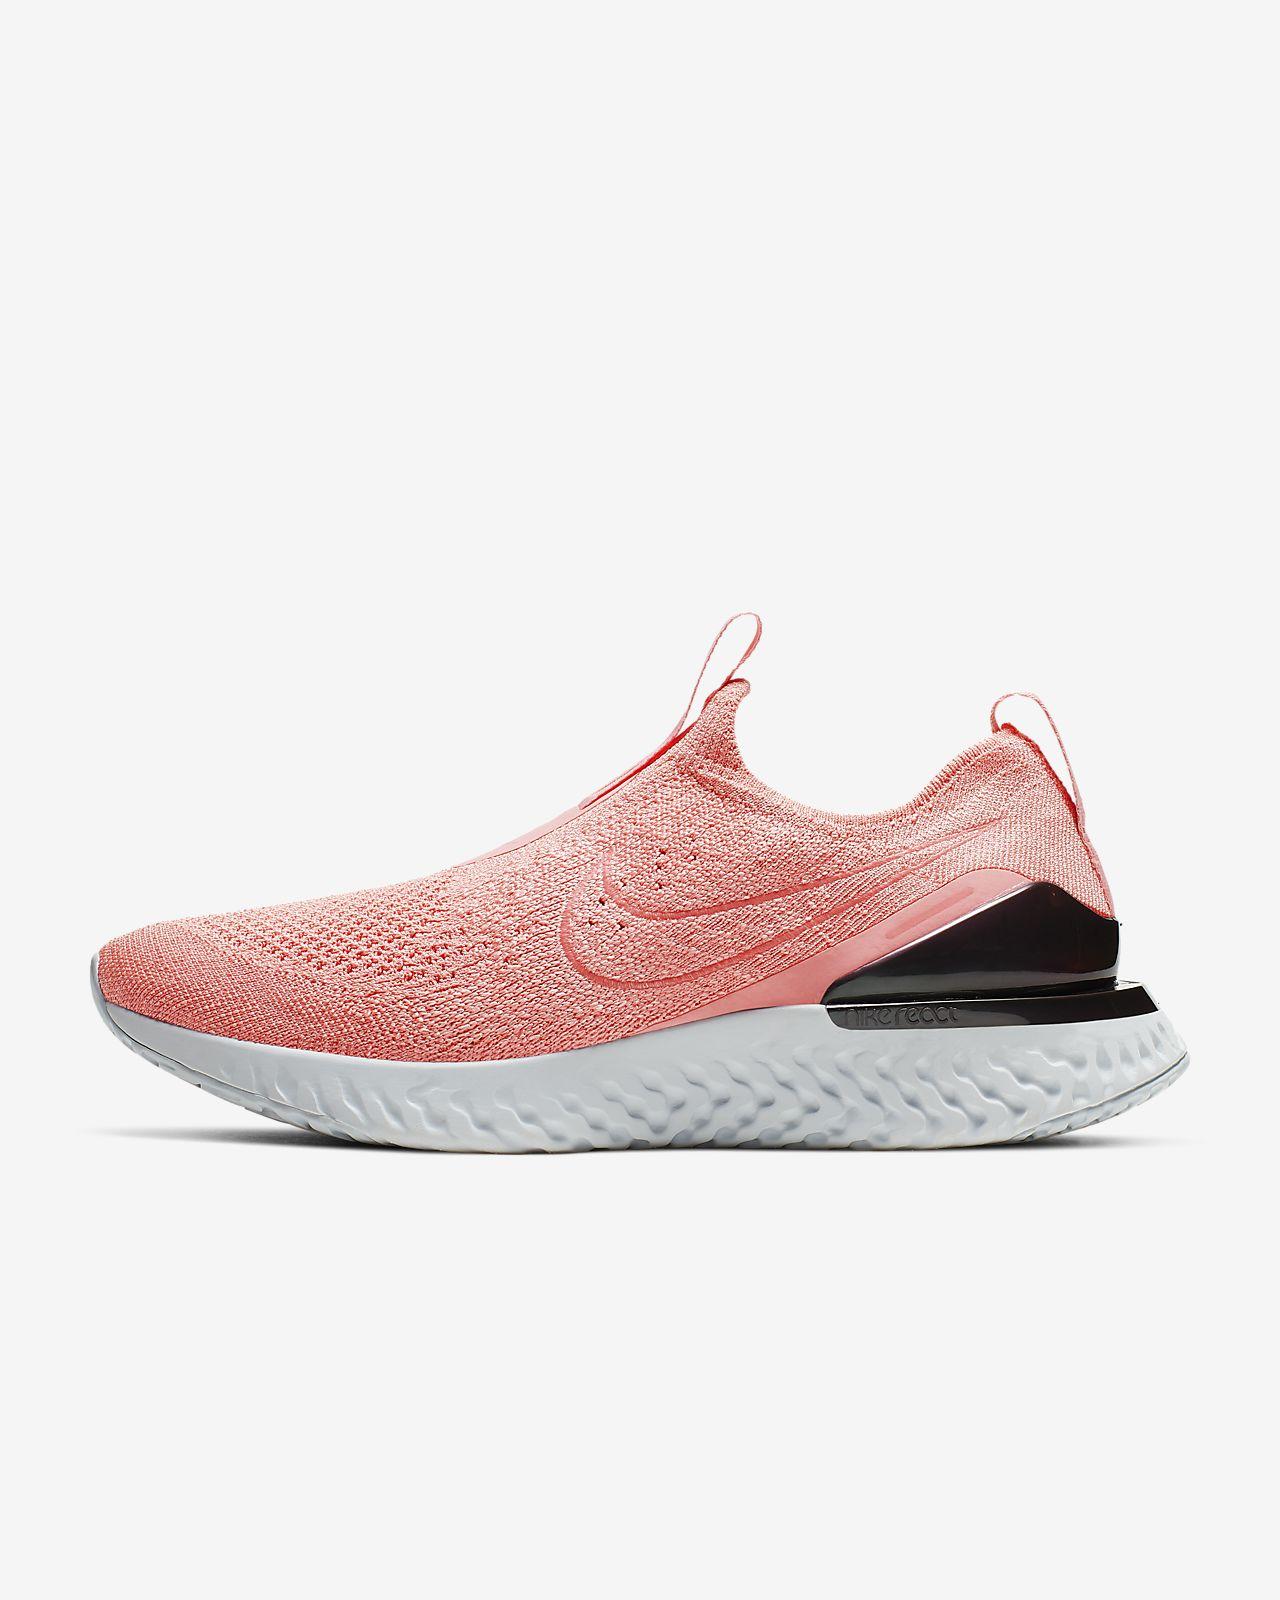 new style 672c0 87f35 ... Chaussure de running Nike Epic Phantom React Flyknit pour Femme